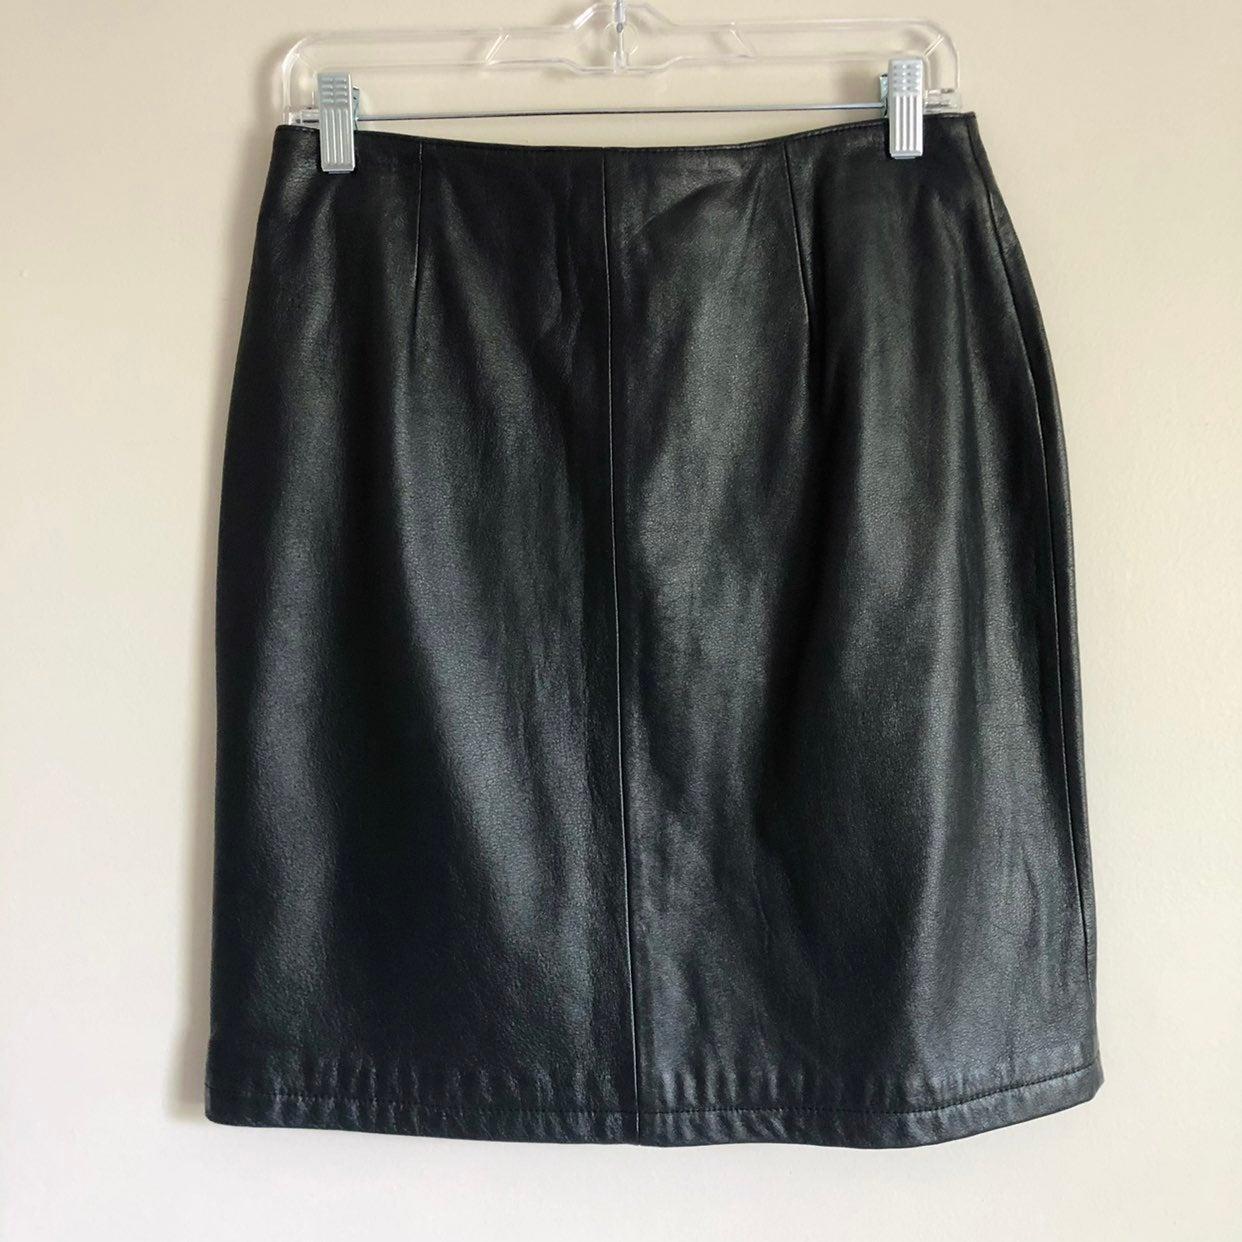 Wilsons Leather Skirt